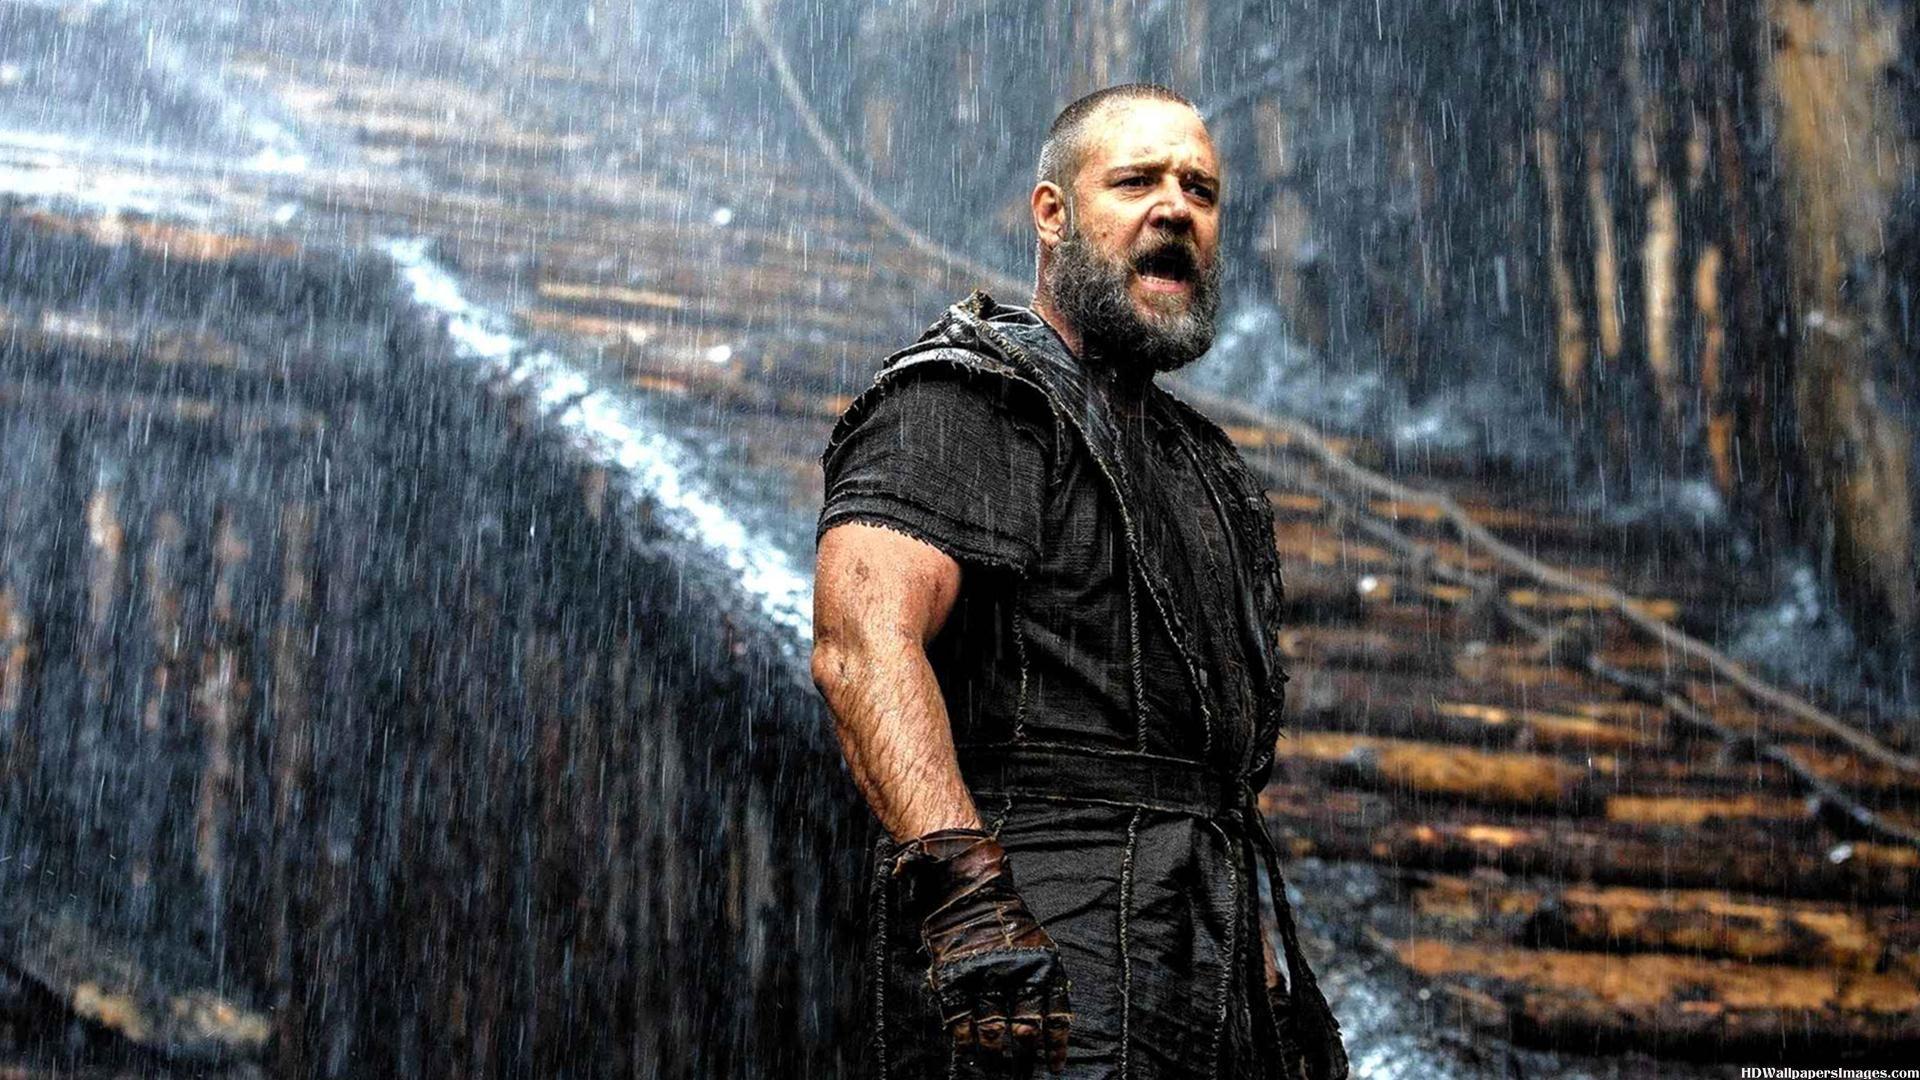 Noah was the man.